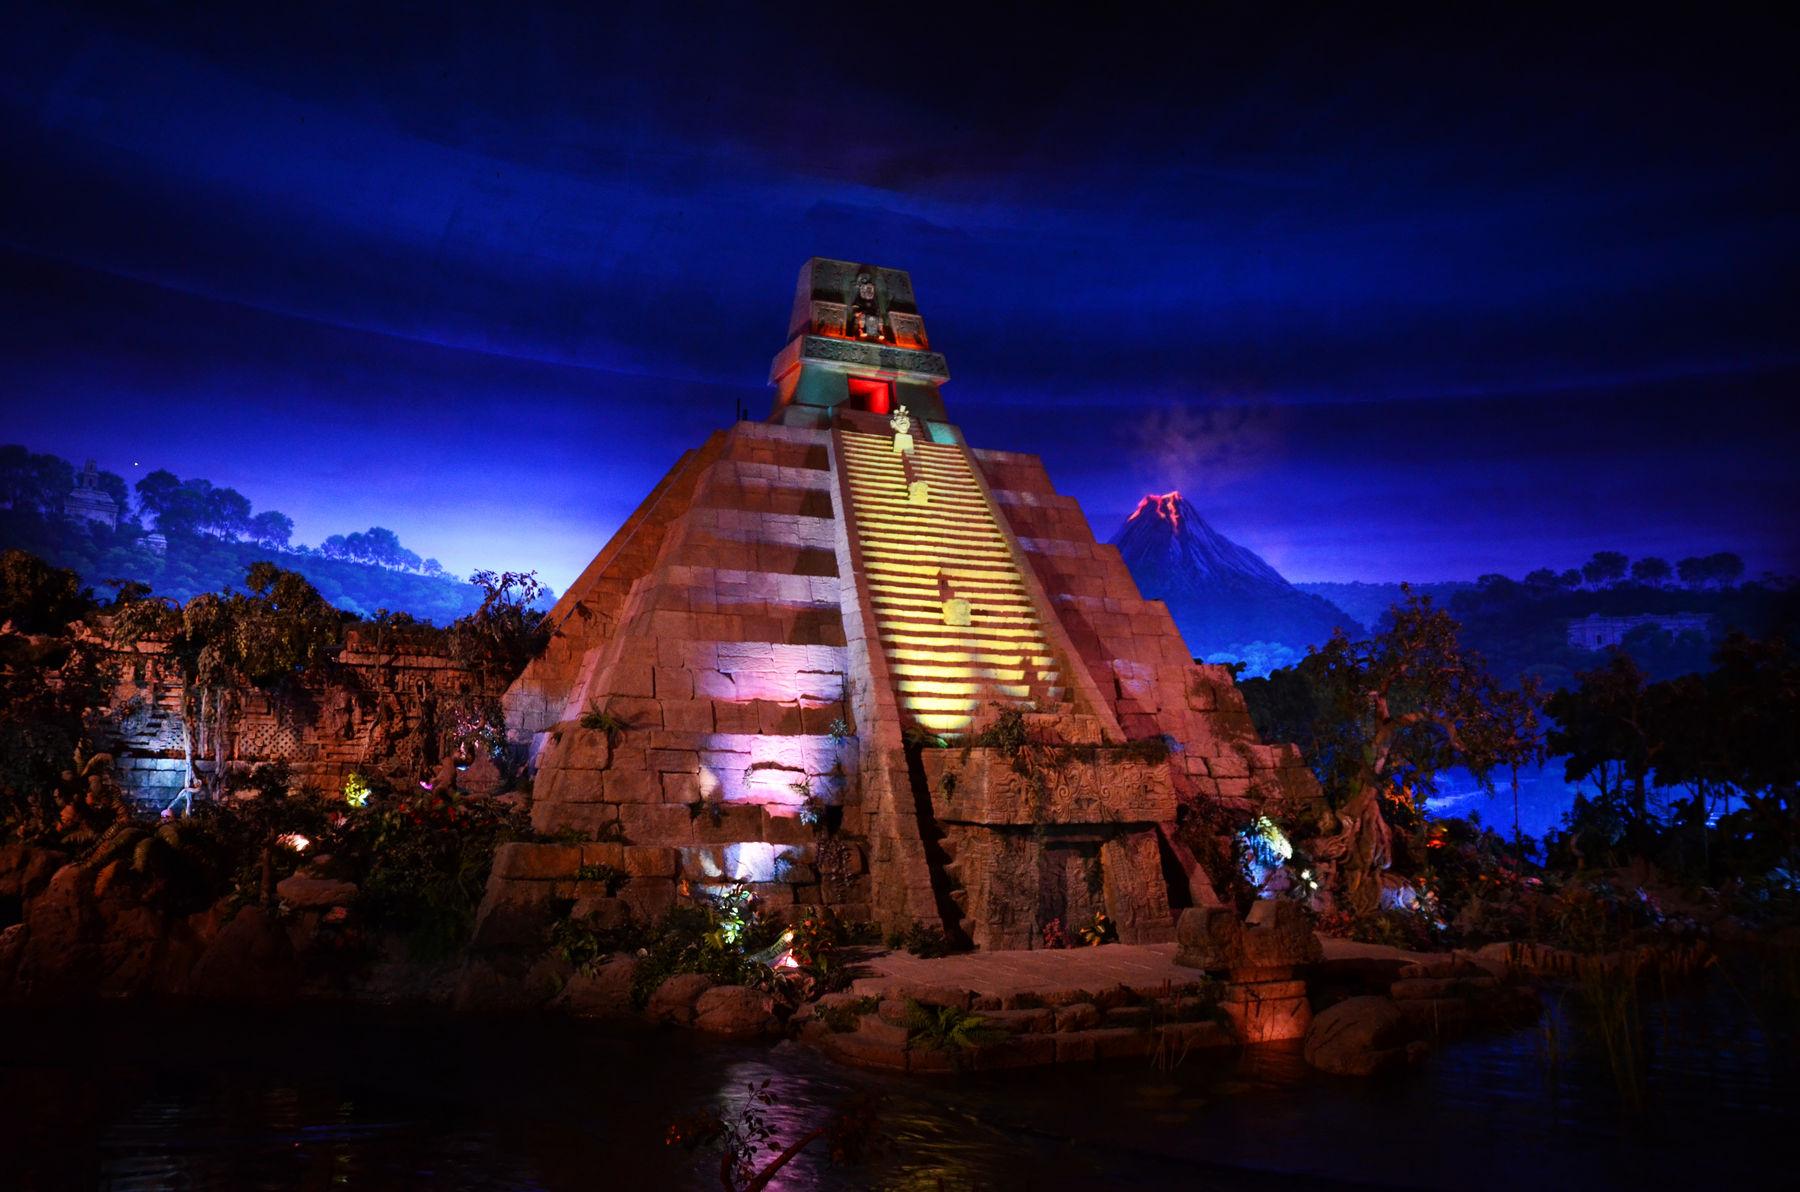 Mexico Pyramids Inside Pyramid at Mexico's Pavilion